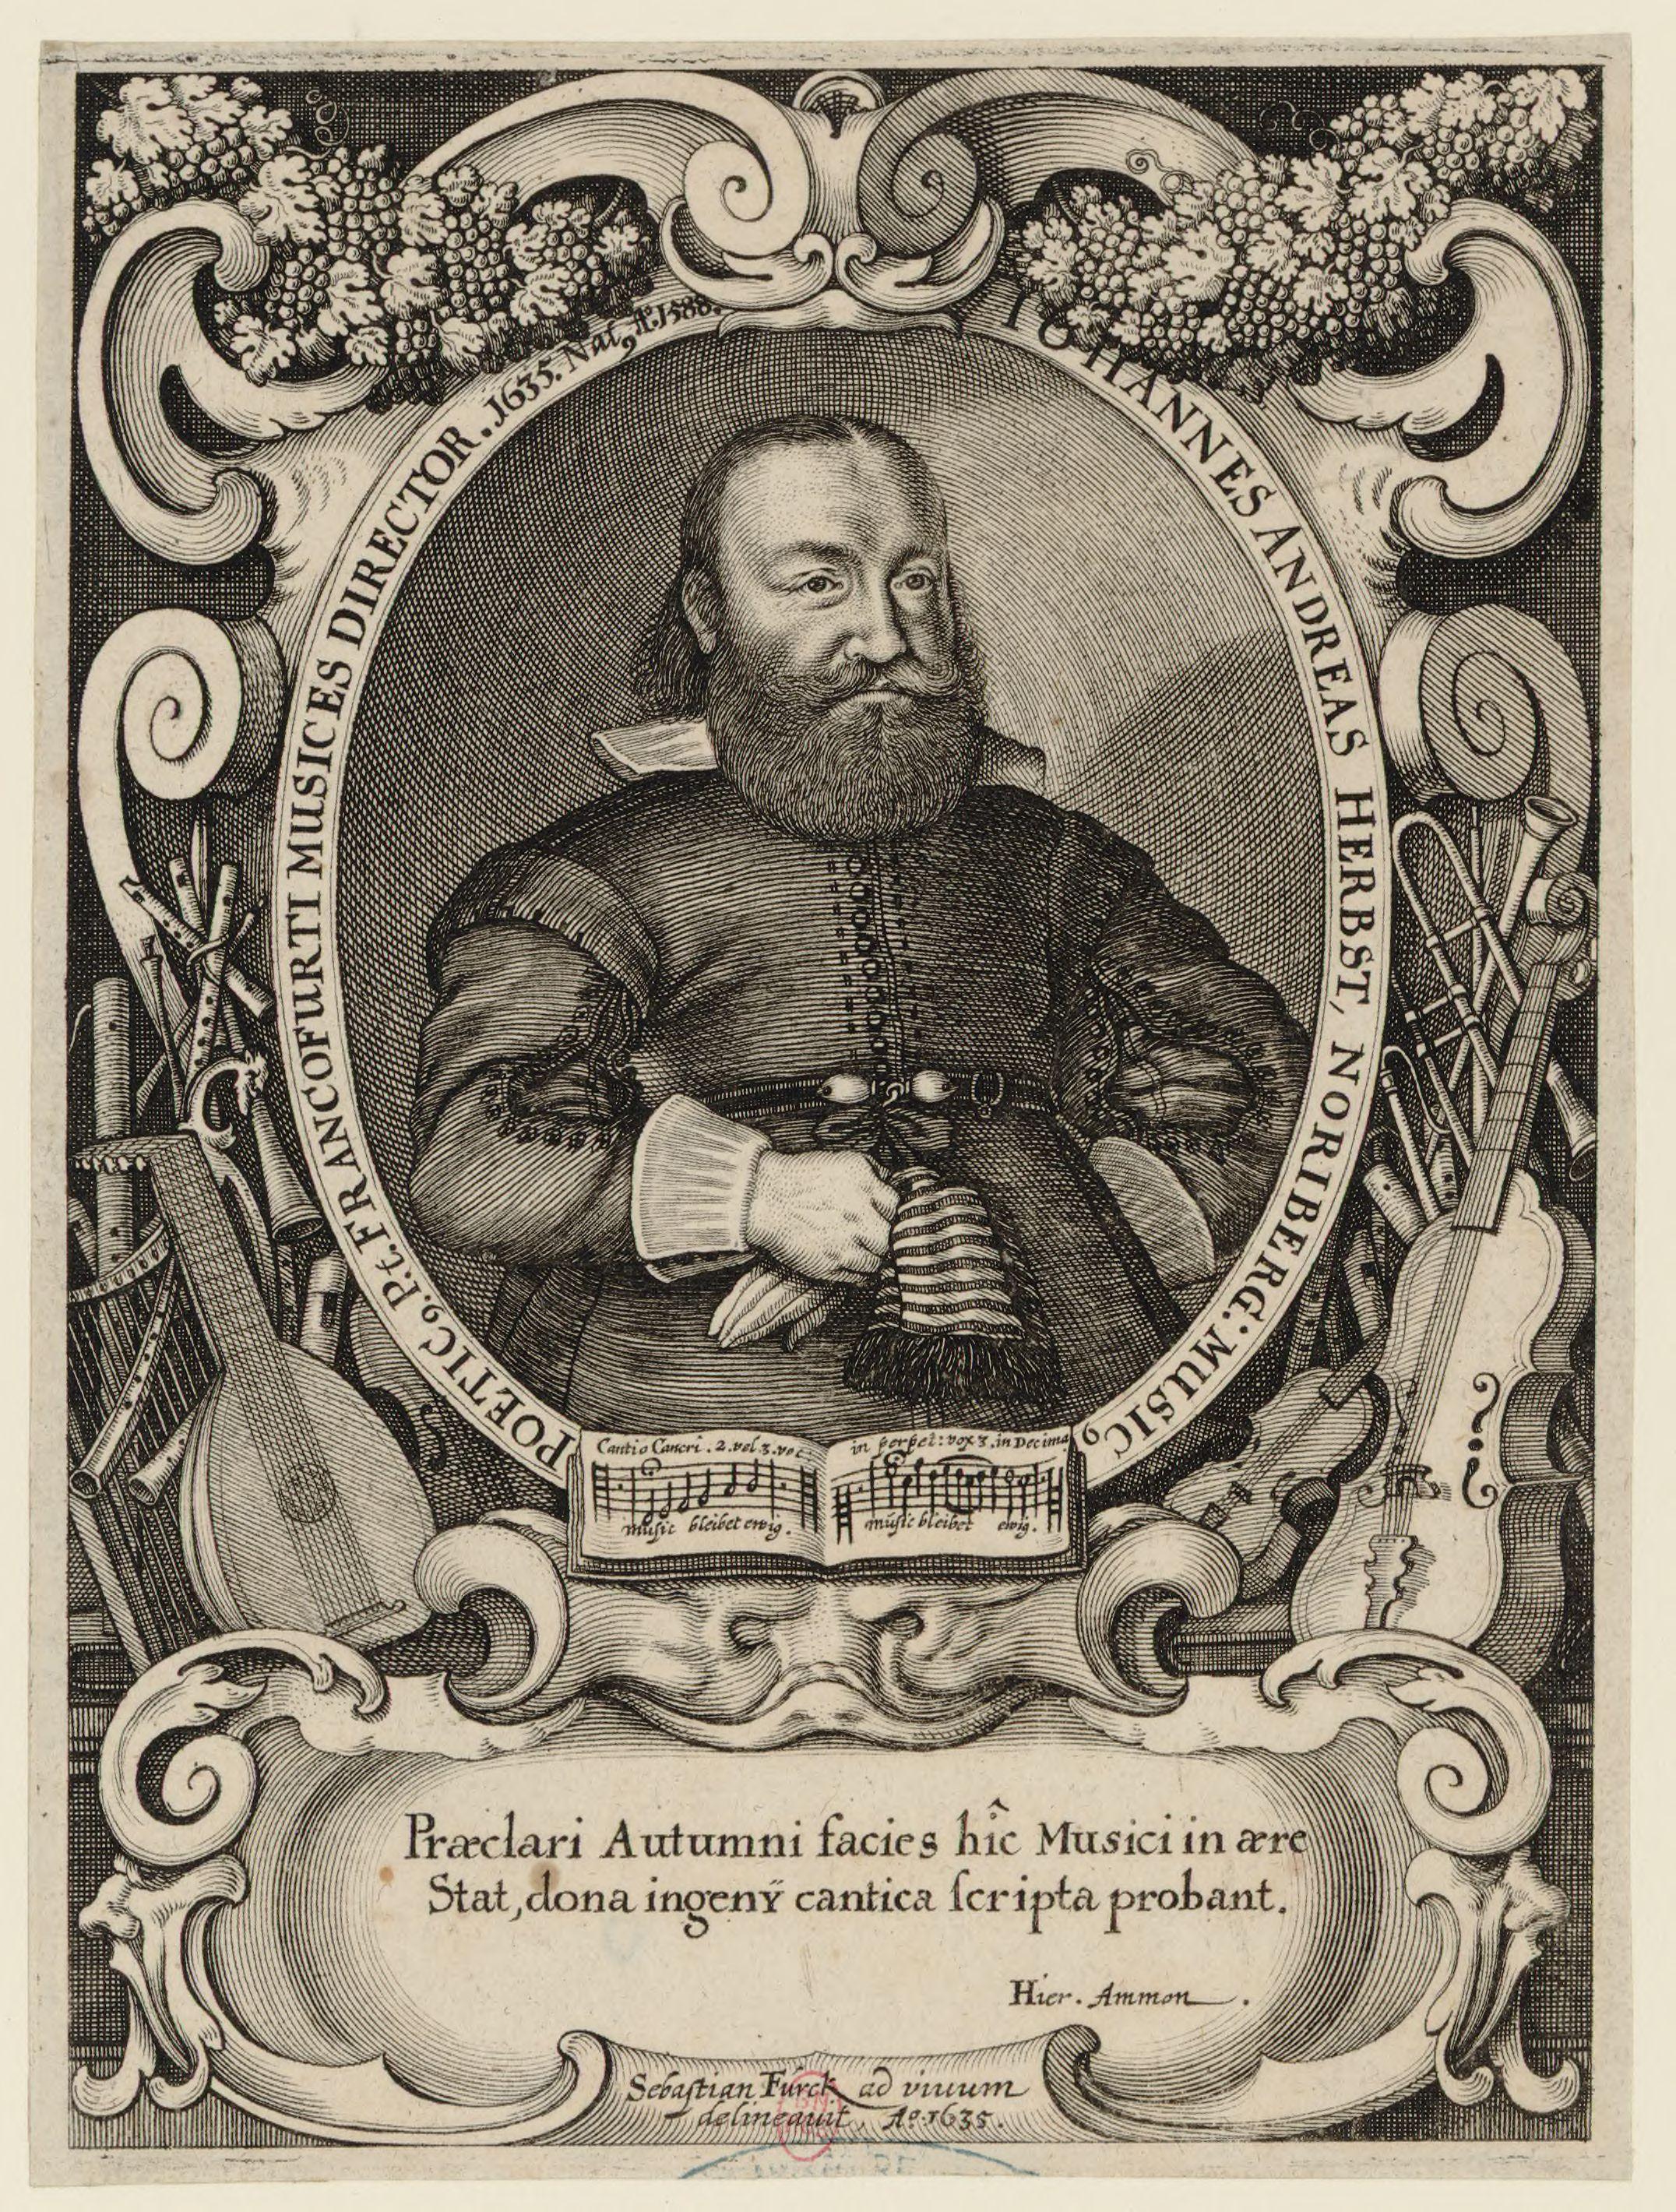 Depiction of Johann Andreas Herbst